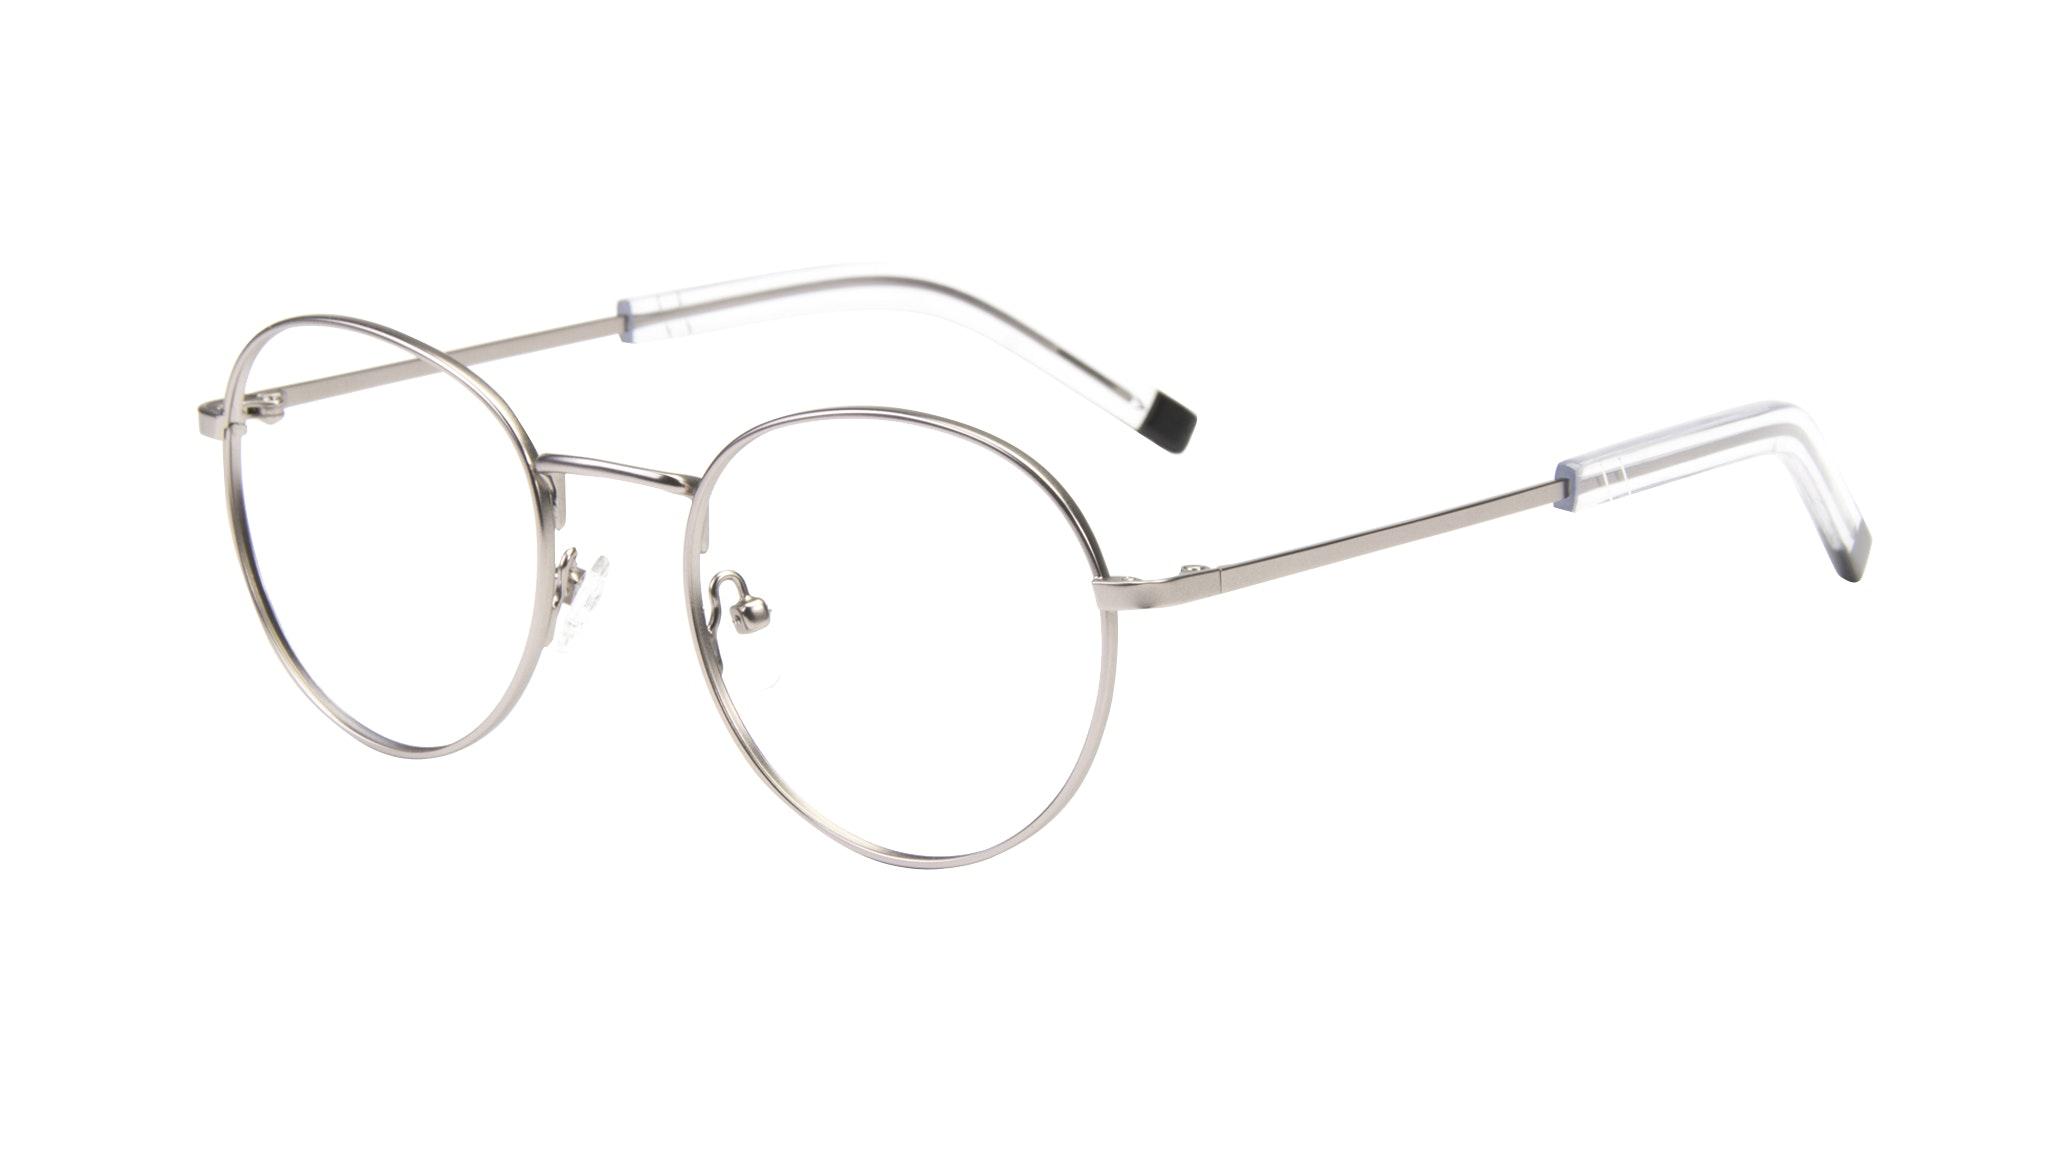 Affordable Fashion Glasses Round Eyeglasses Men Lean Steel Tilt